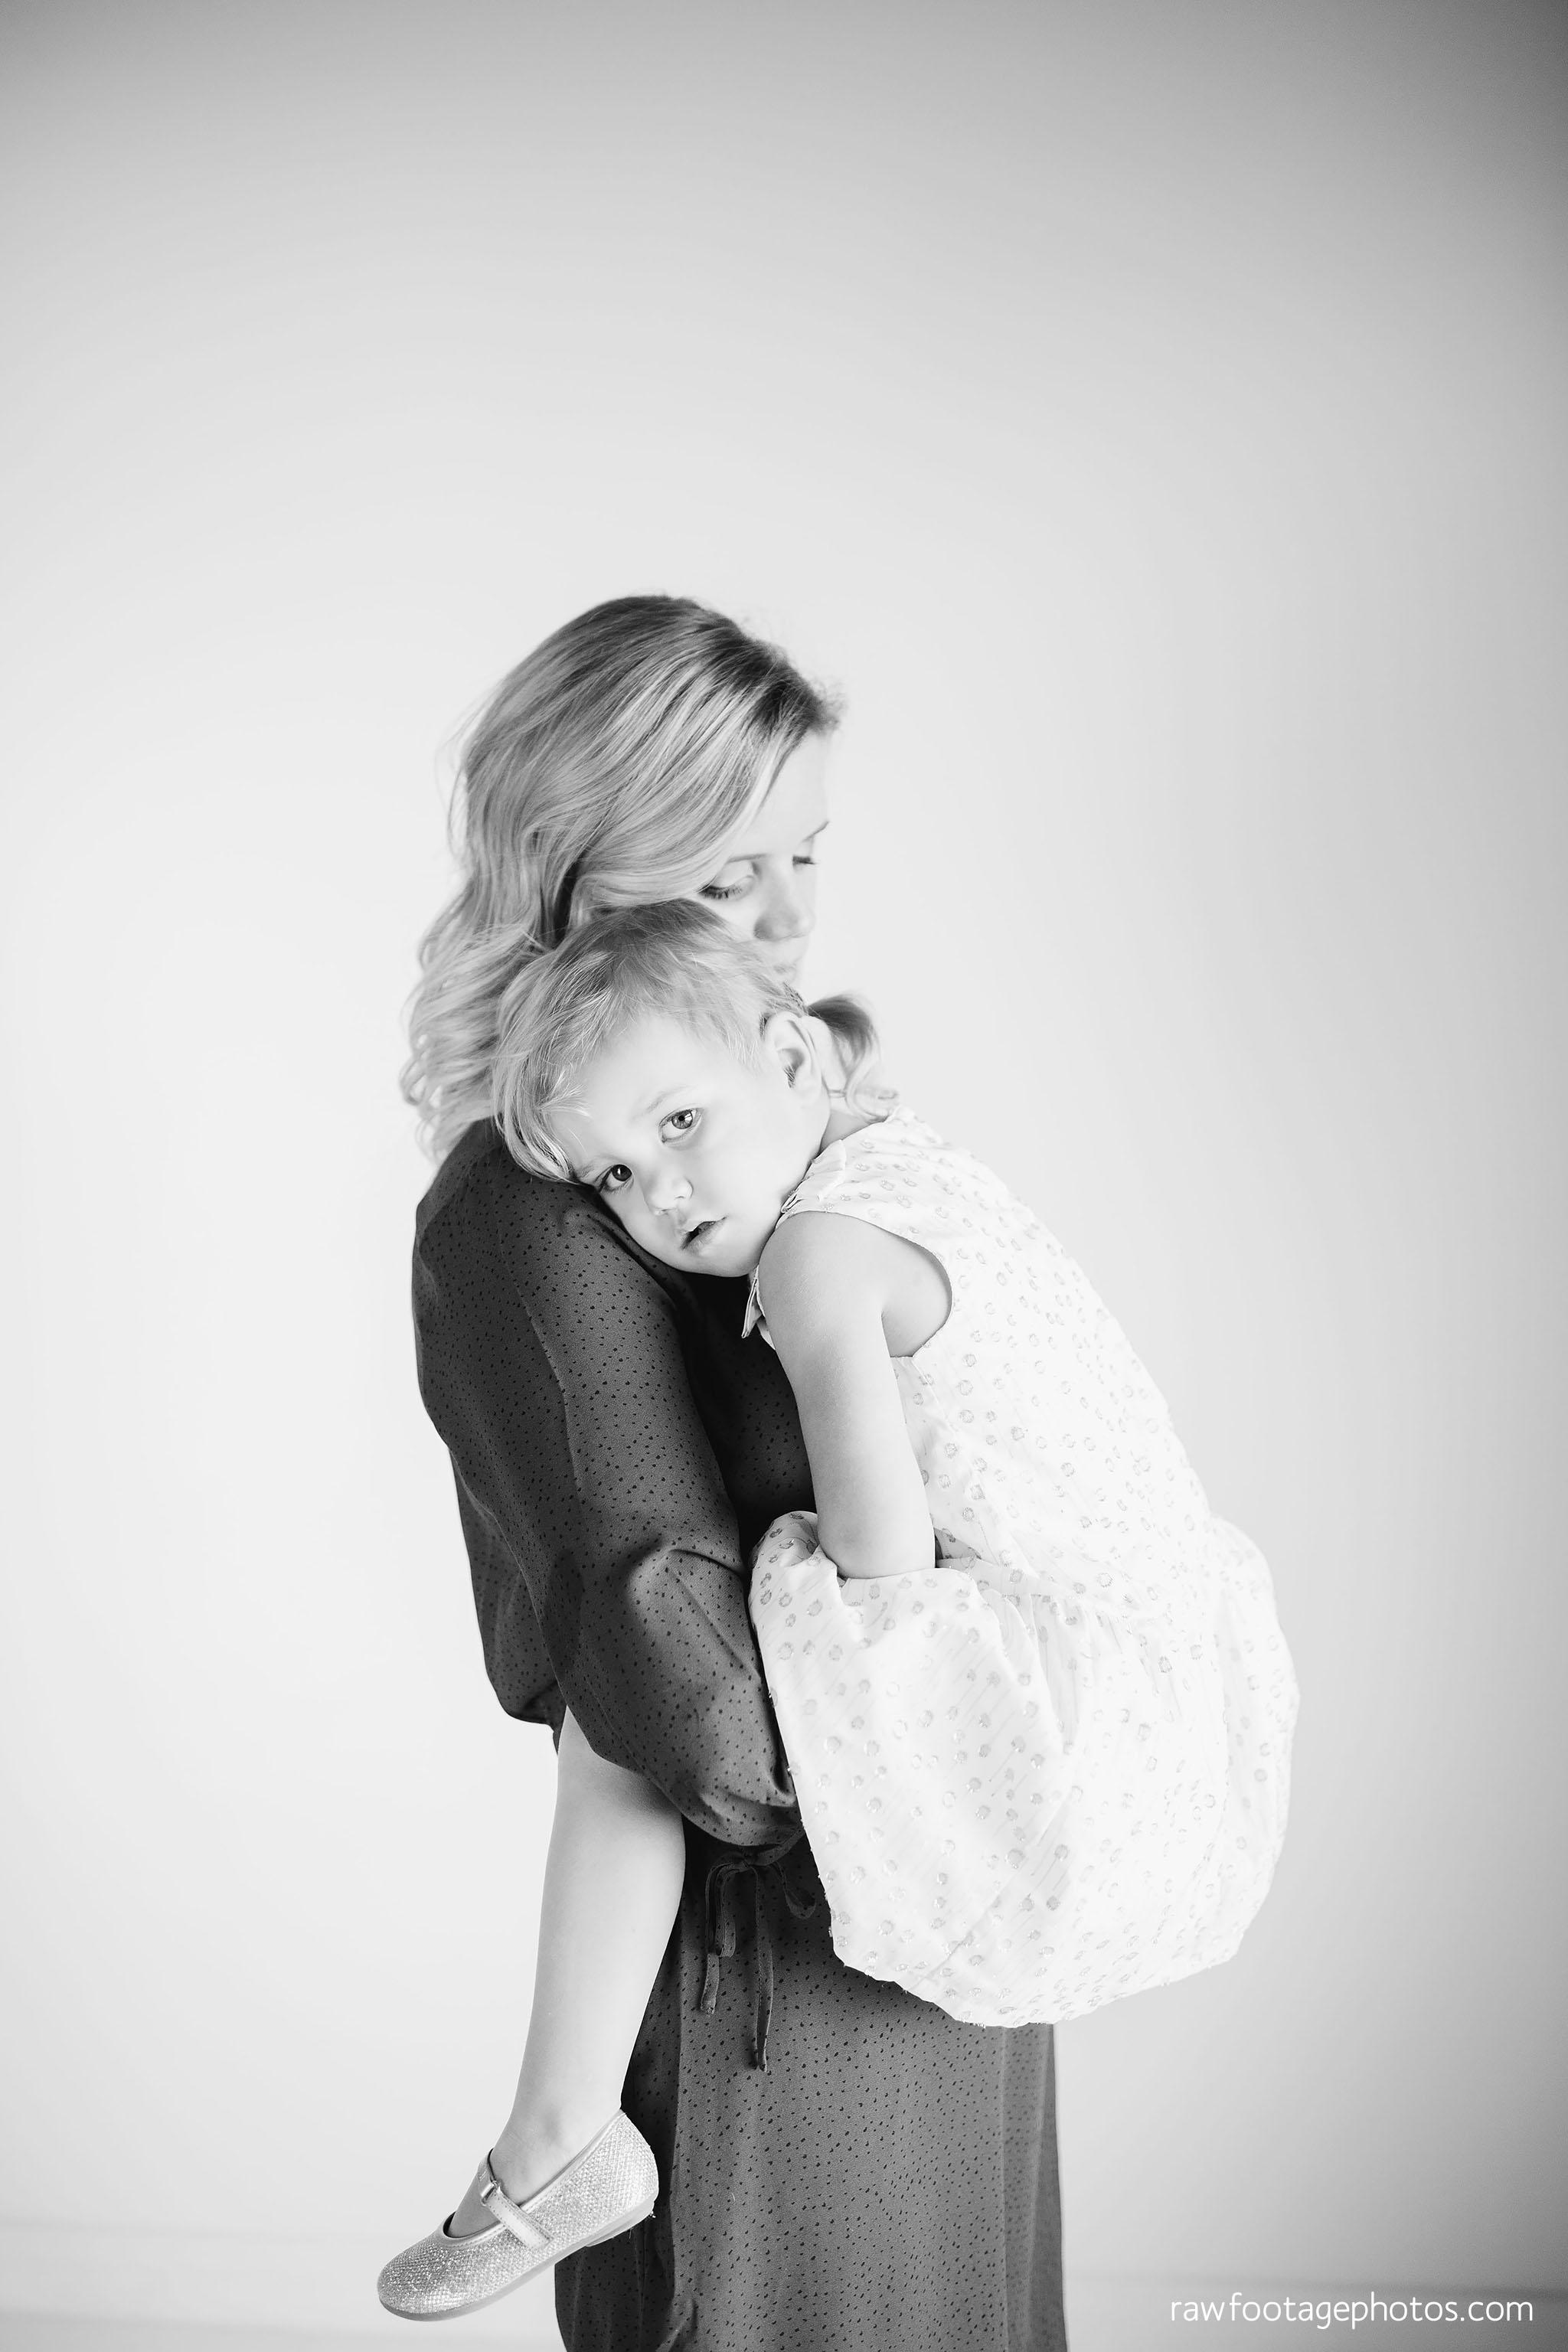 london_ontario_family_photographer-studio_photography-studio_lifestyle_portraits-white_studio-mother_son-candid_family_photography-raw_footage_photography038.jpg